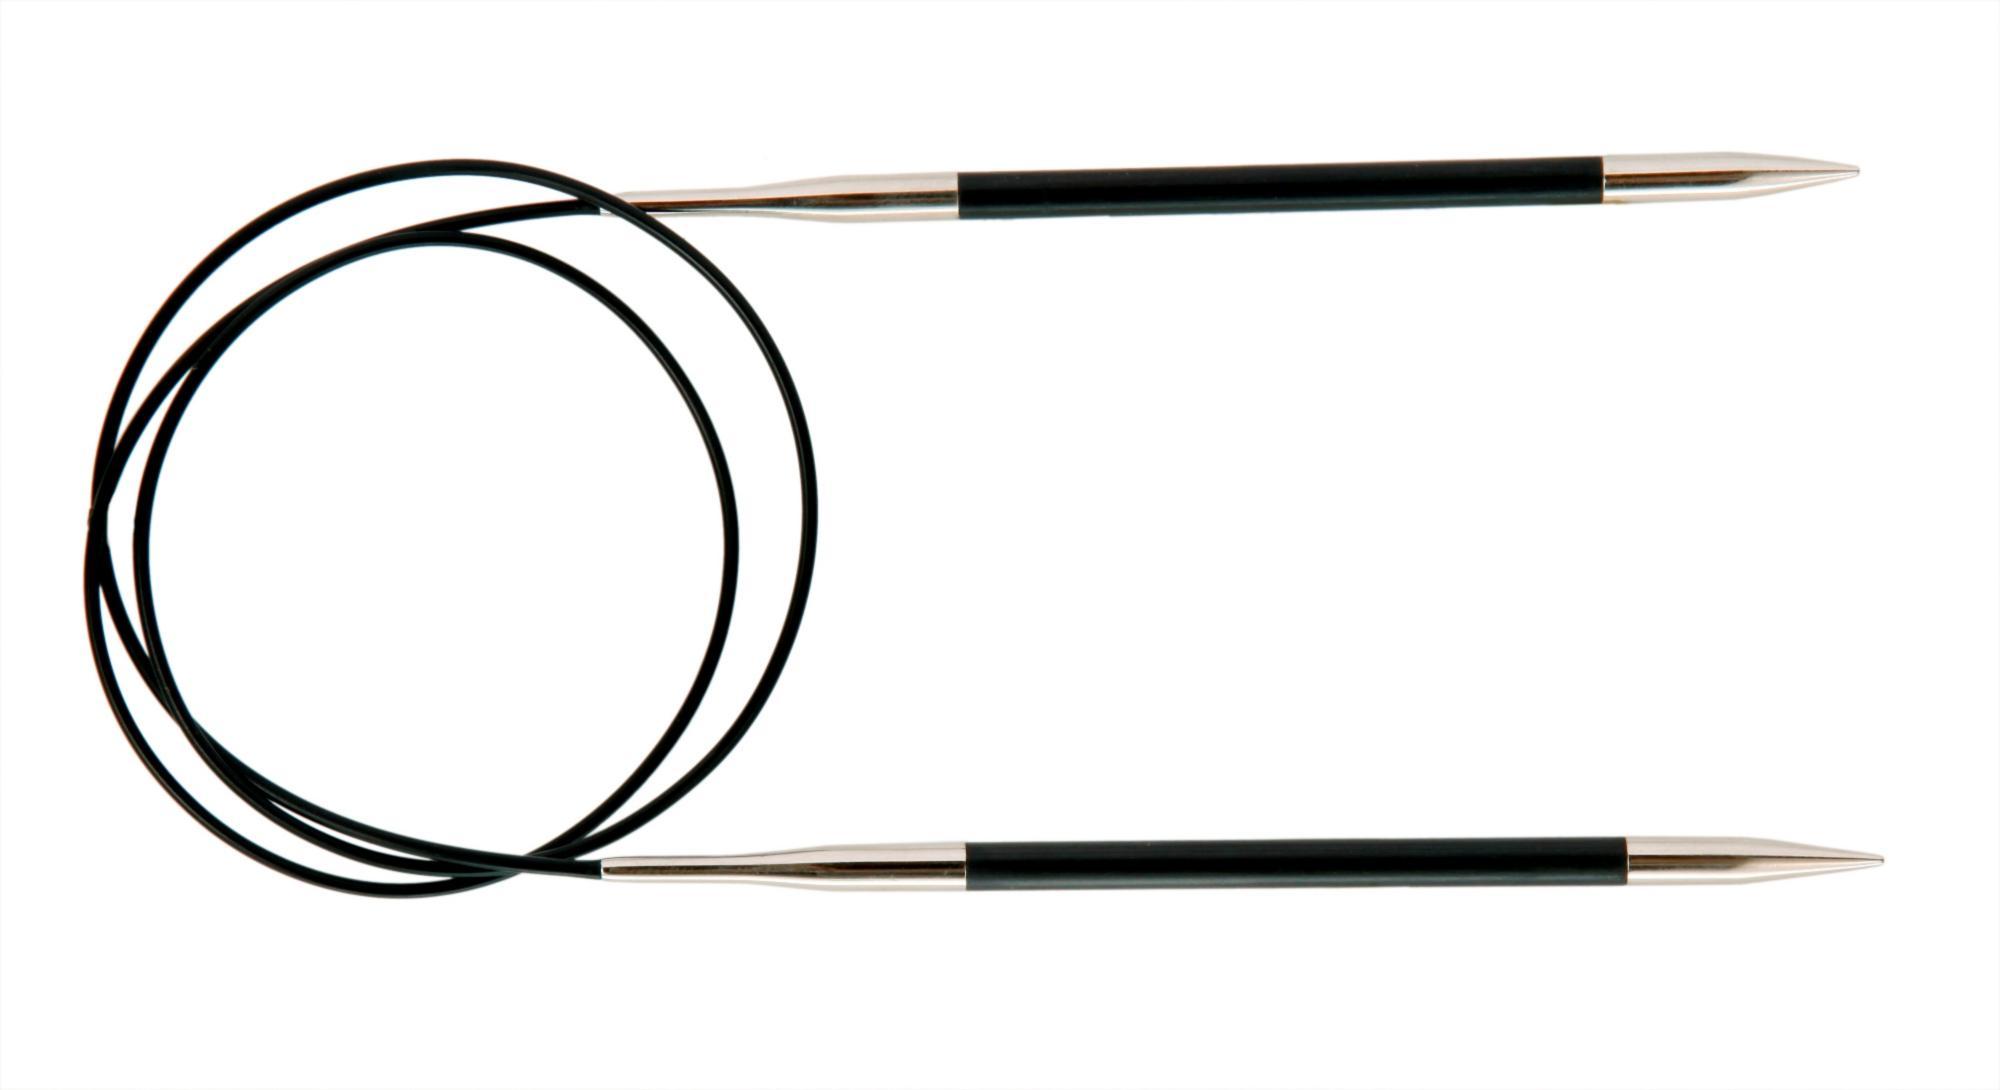 Спицы круговые 60 см Karbonz KnitPro, 41168, 4.00 мм